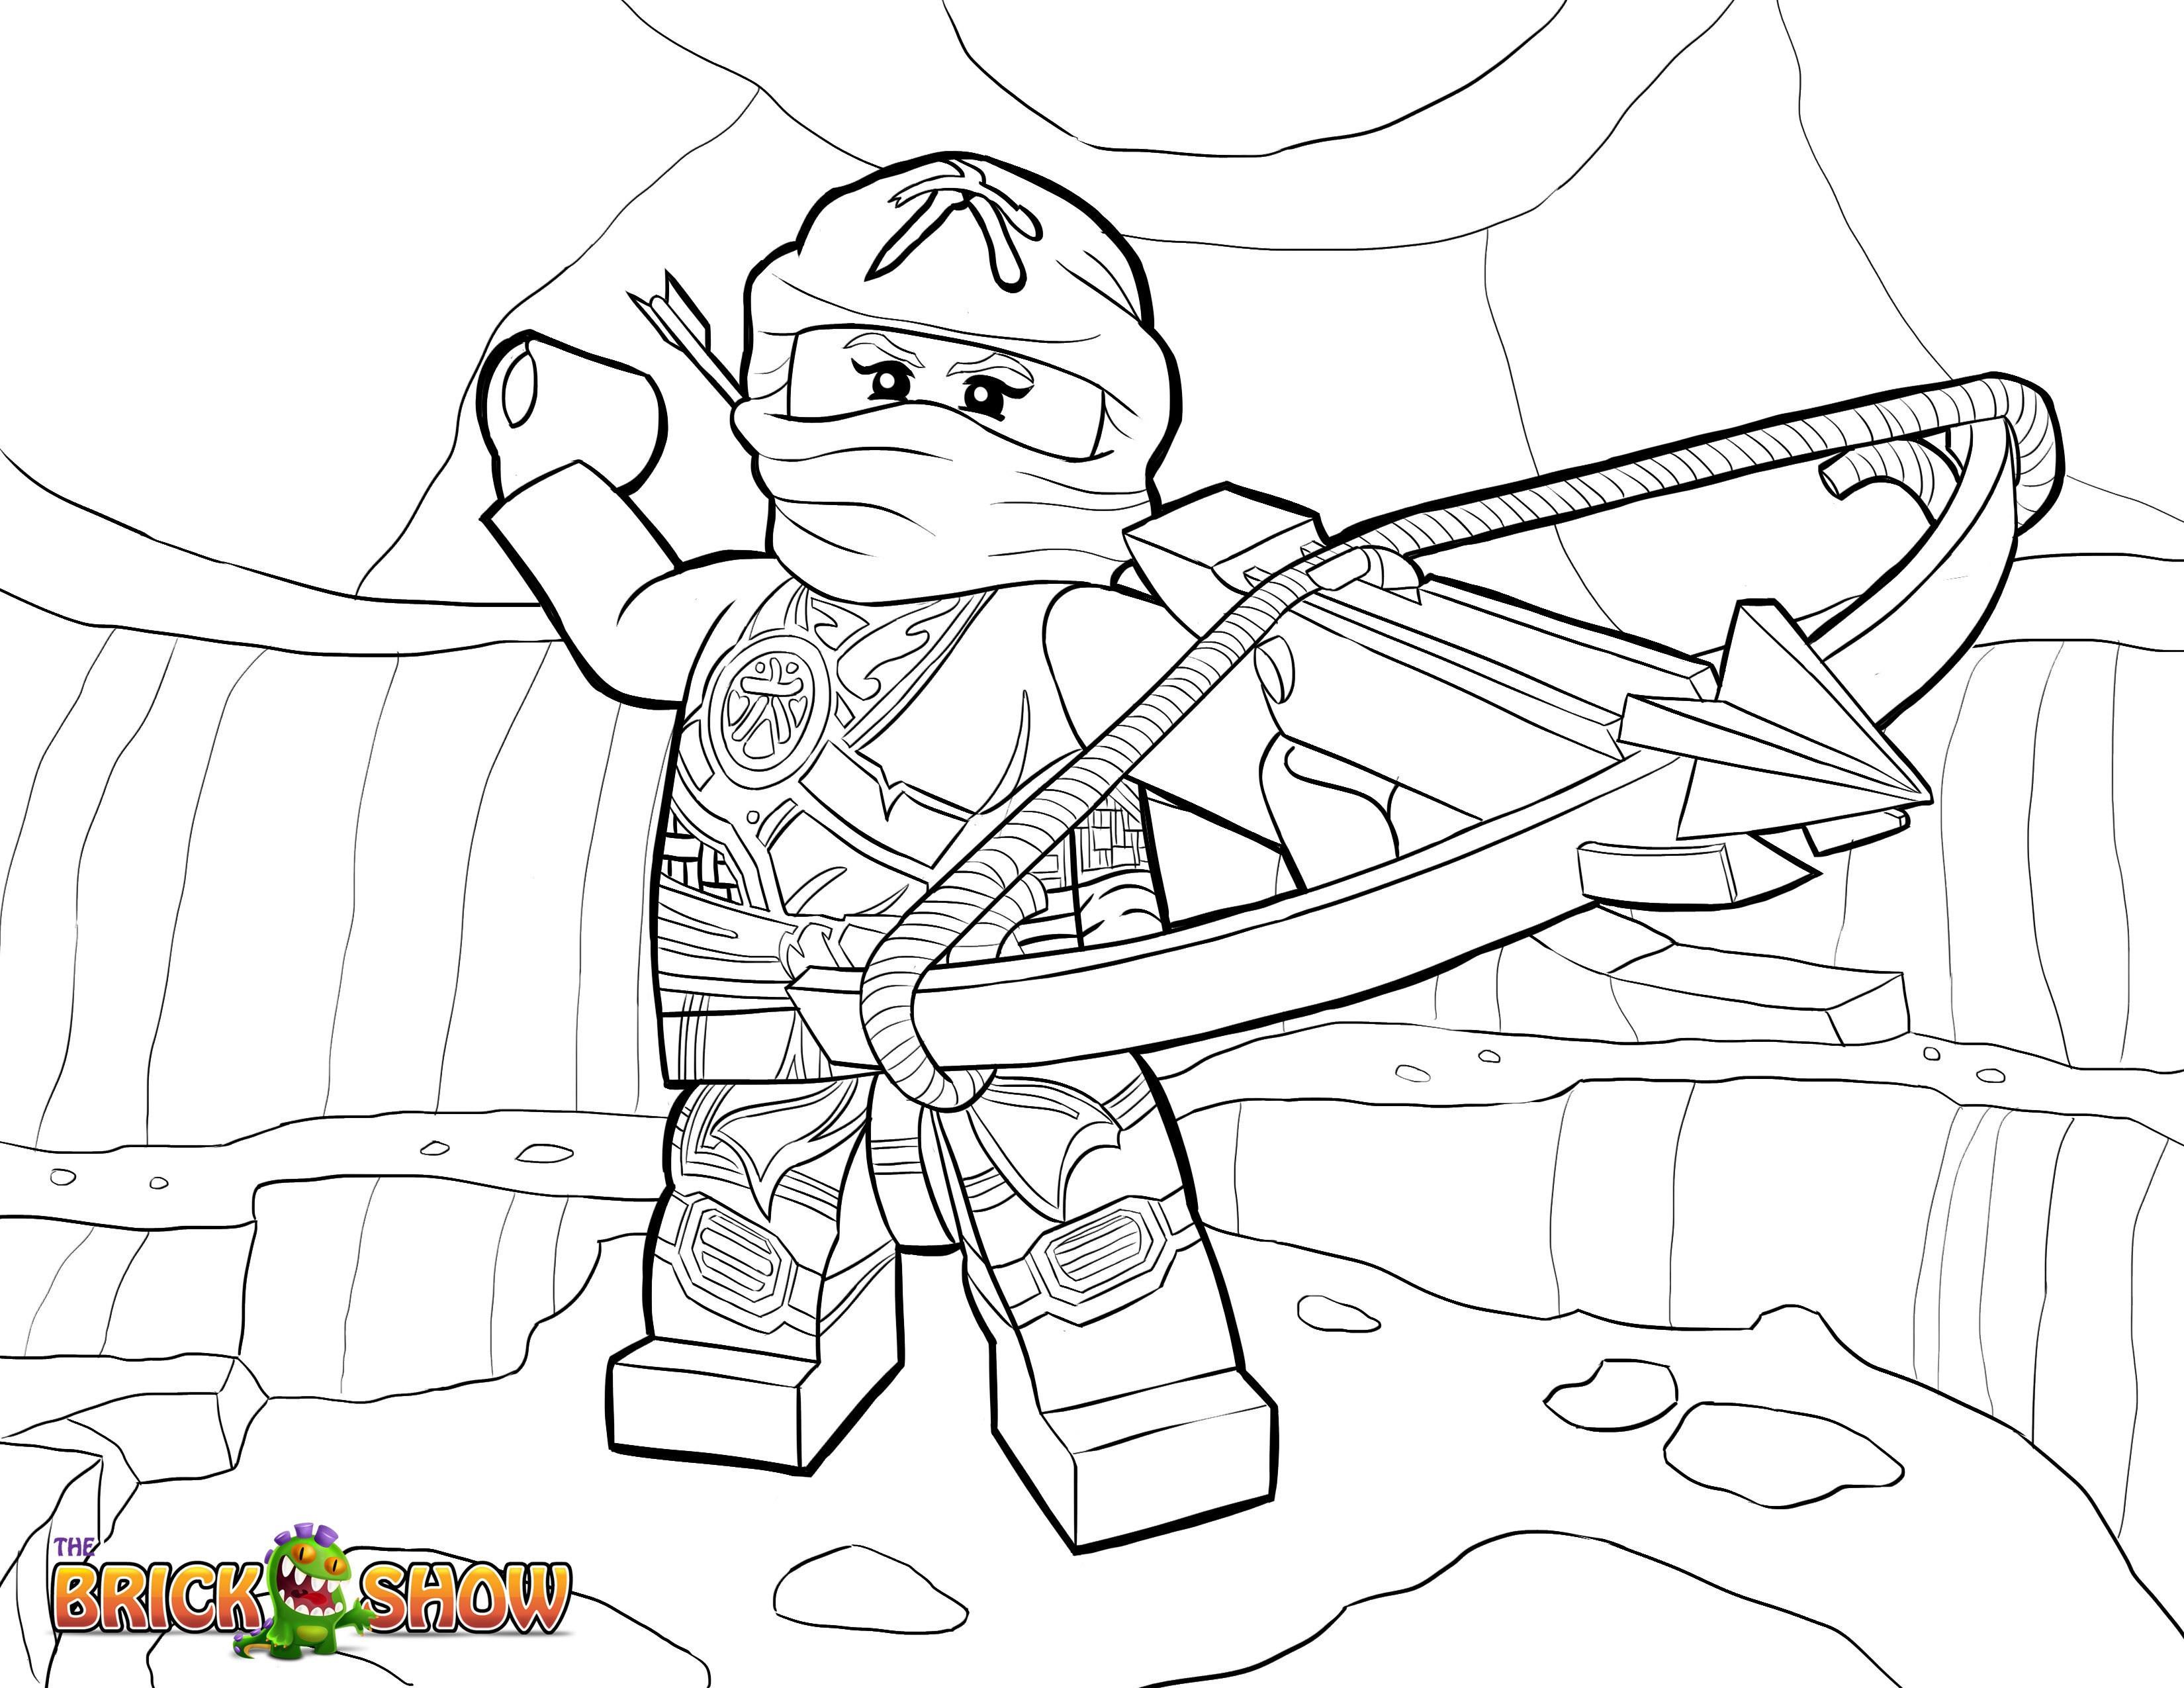 Ninjago Ausmalbilder Lego Das Beste Von Ausmalbilder Lego Ninjago Morro Schön Malvorlagen Ninjago Lloyd Neu Bild